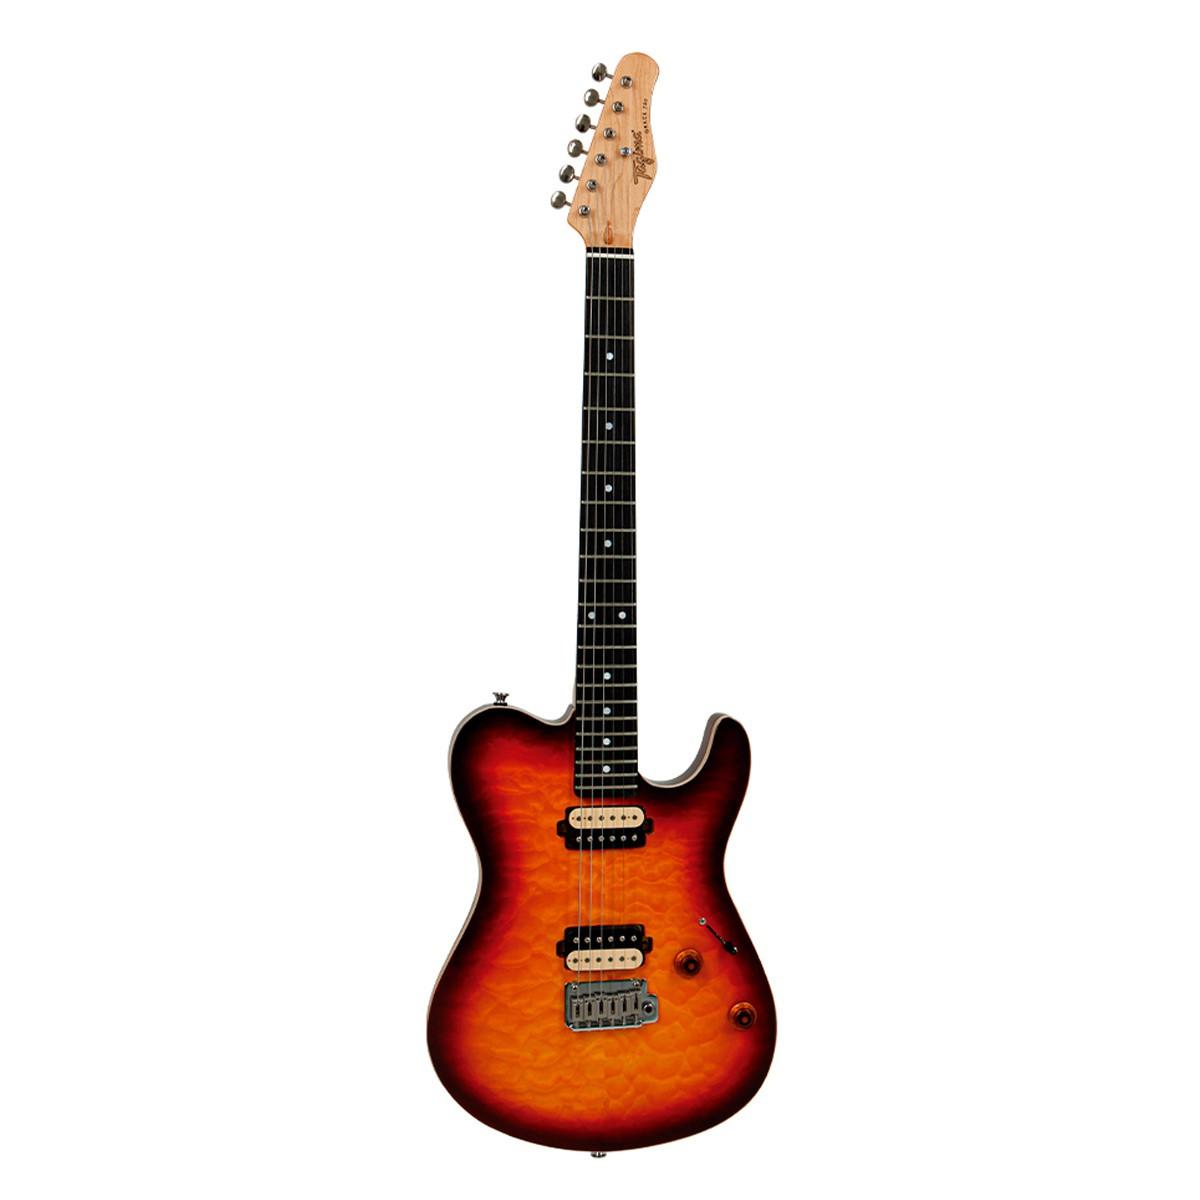 Guitarra Elétrica Tagima Grace 700 Cacau Santos Signature